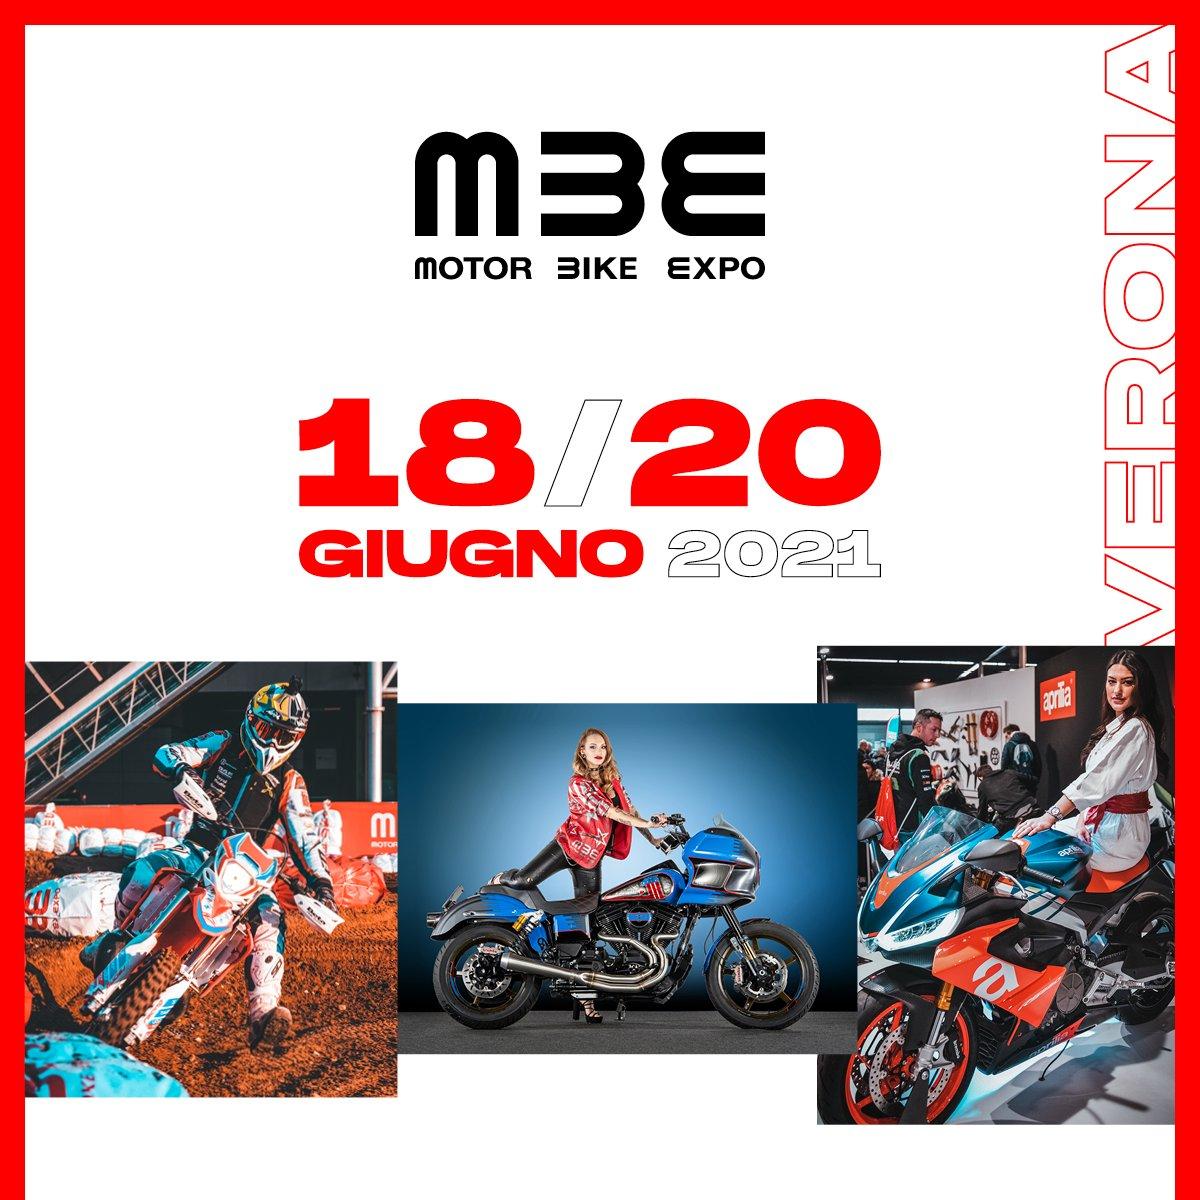 Motor Bike Expo dal 18 al 20 Giugno